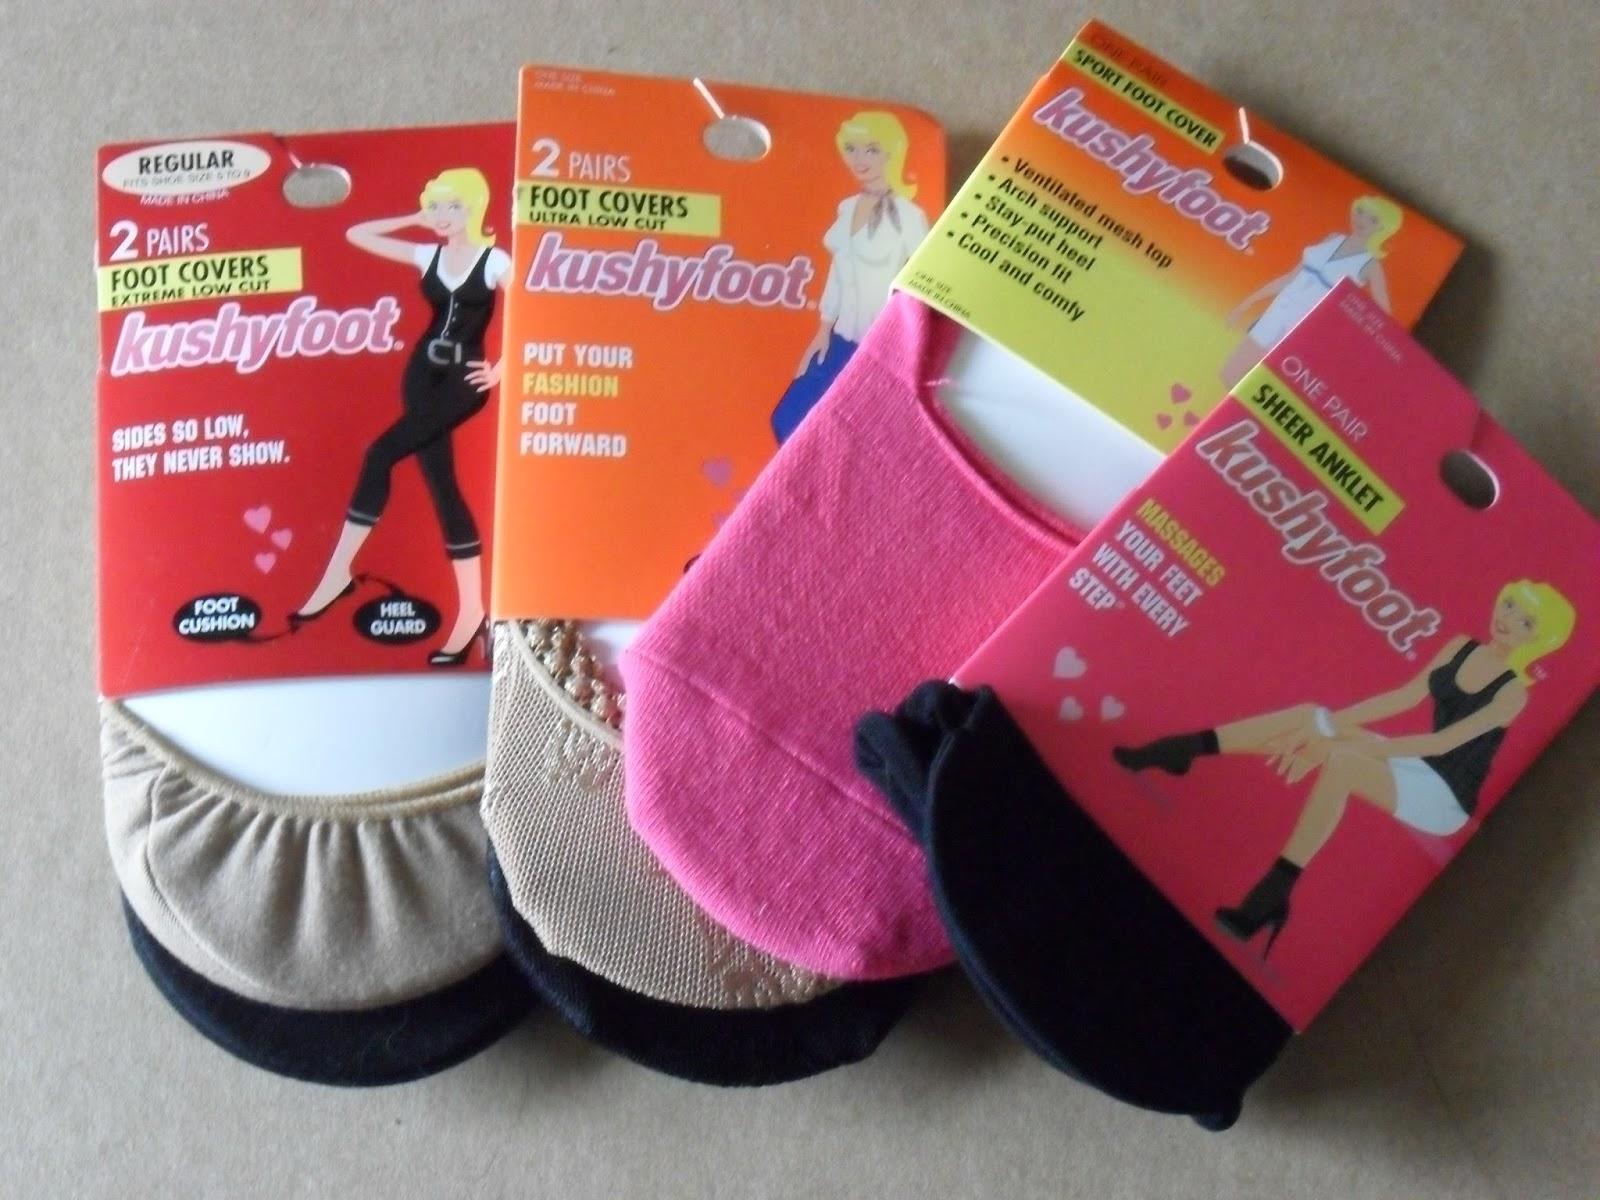 Kushyfoot, more than socks: a fashion statement . Review